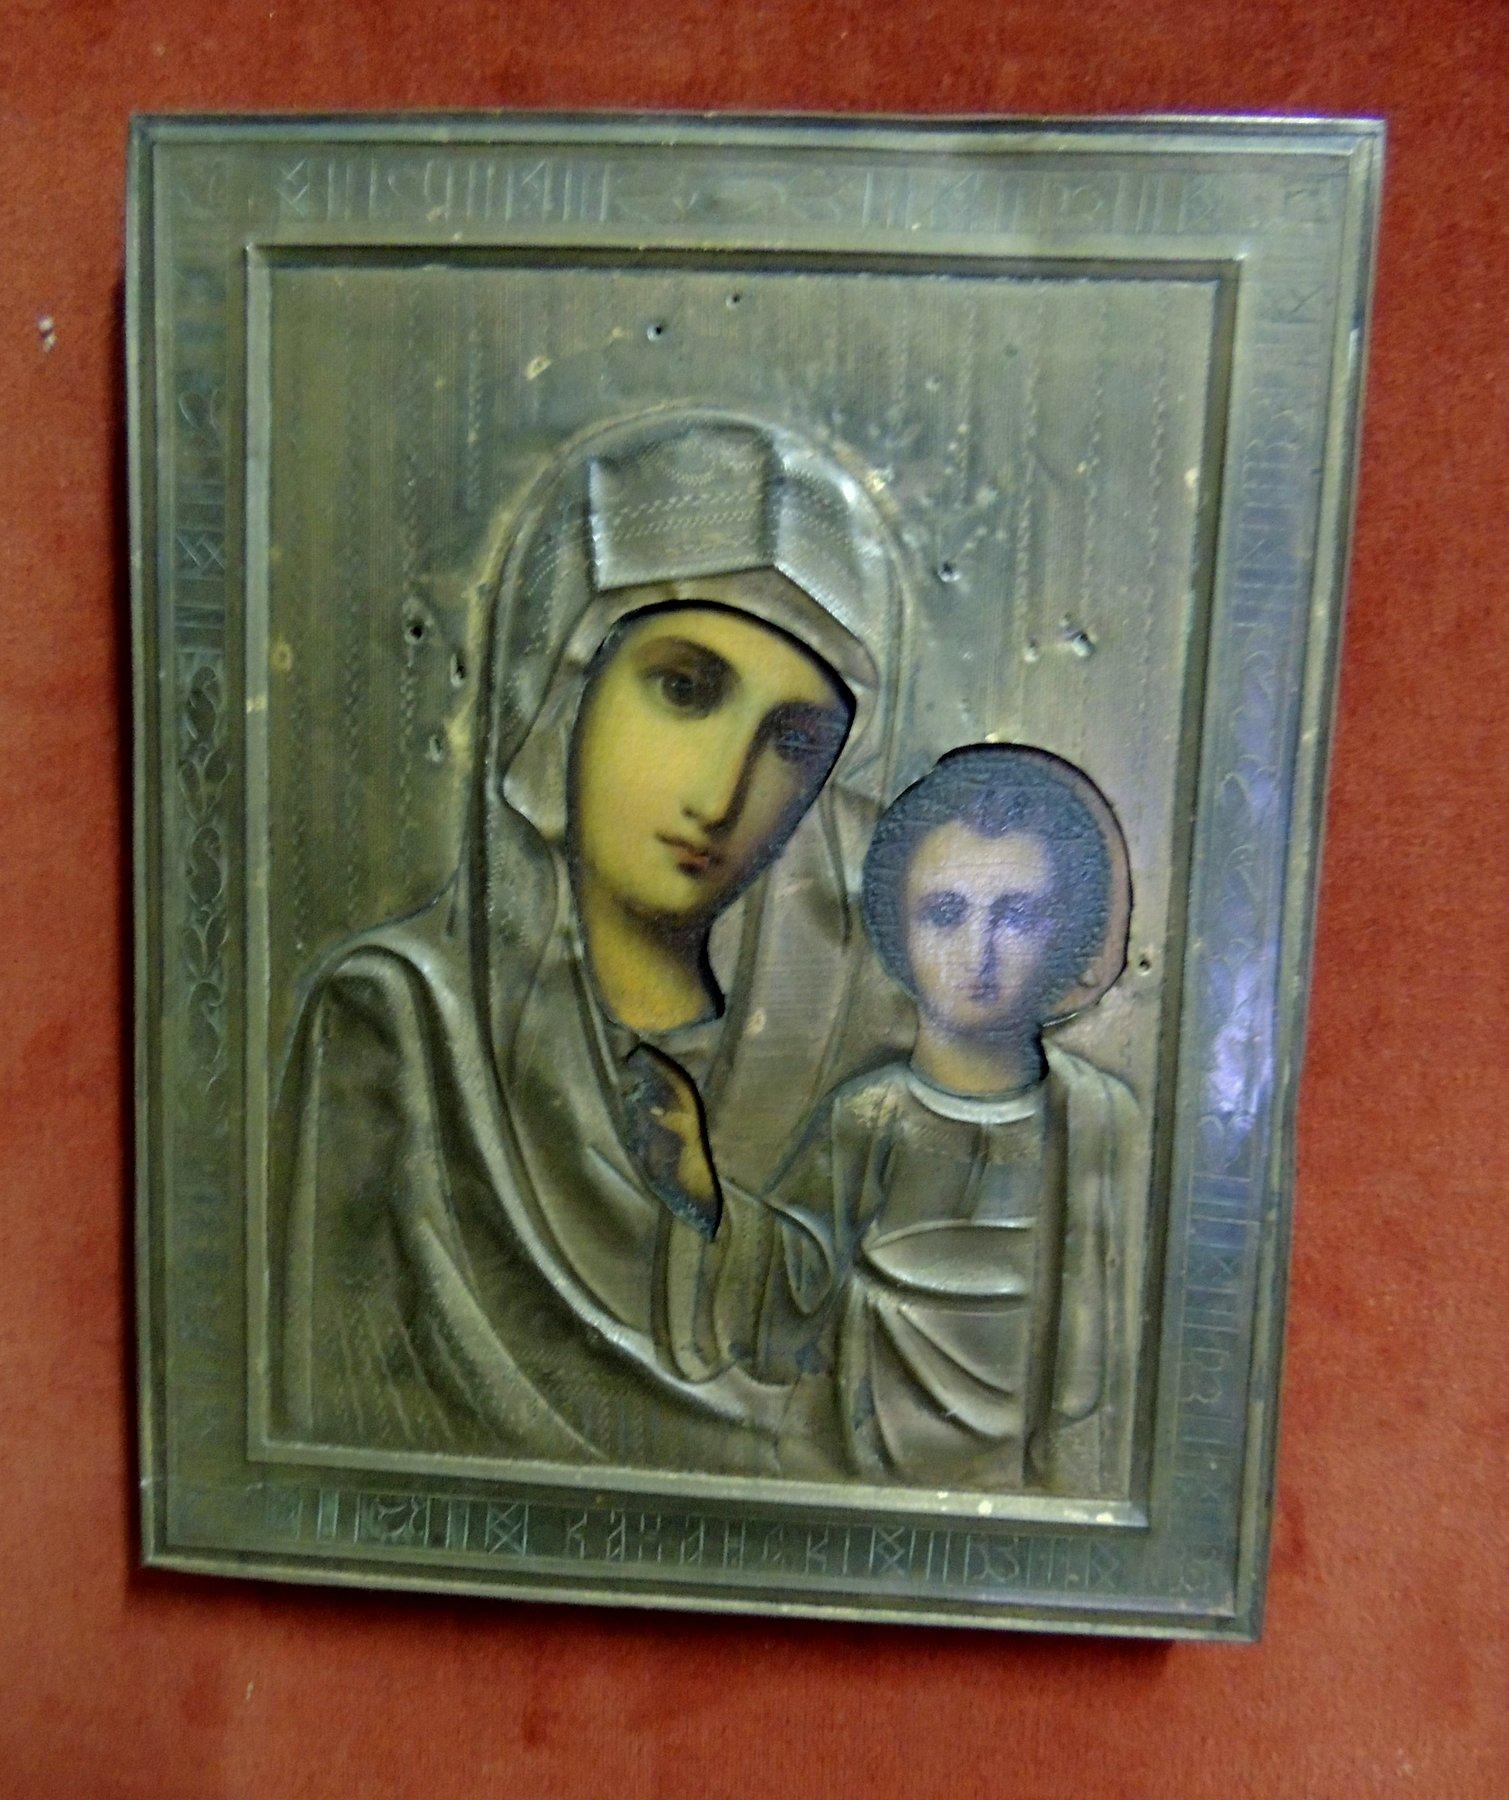 thumb3|icona con madonna cm 18 x 22,5